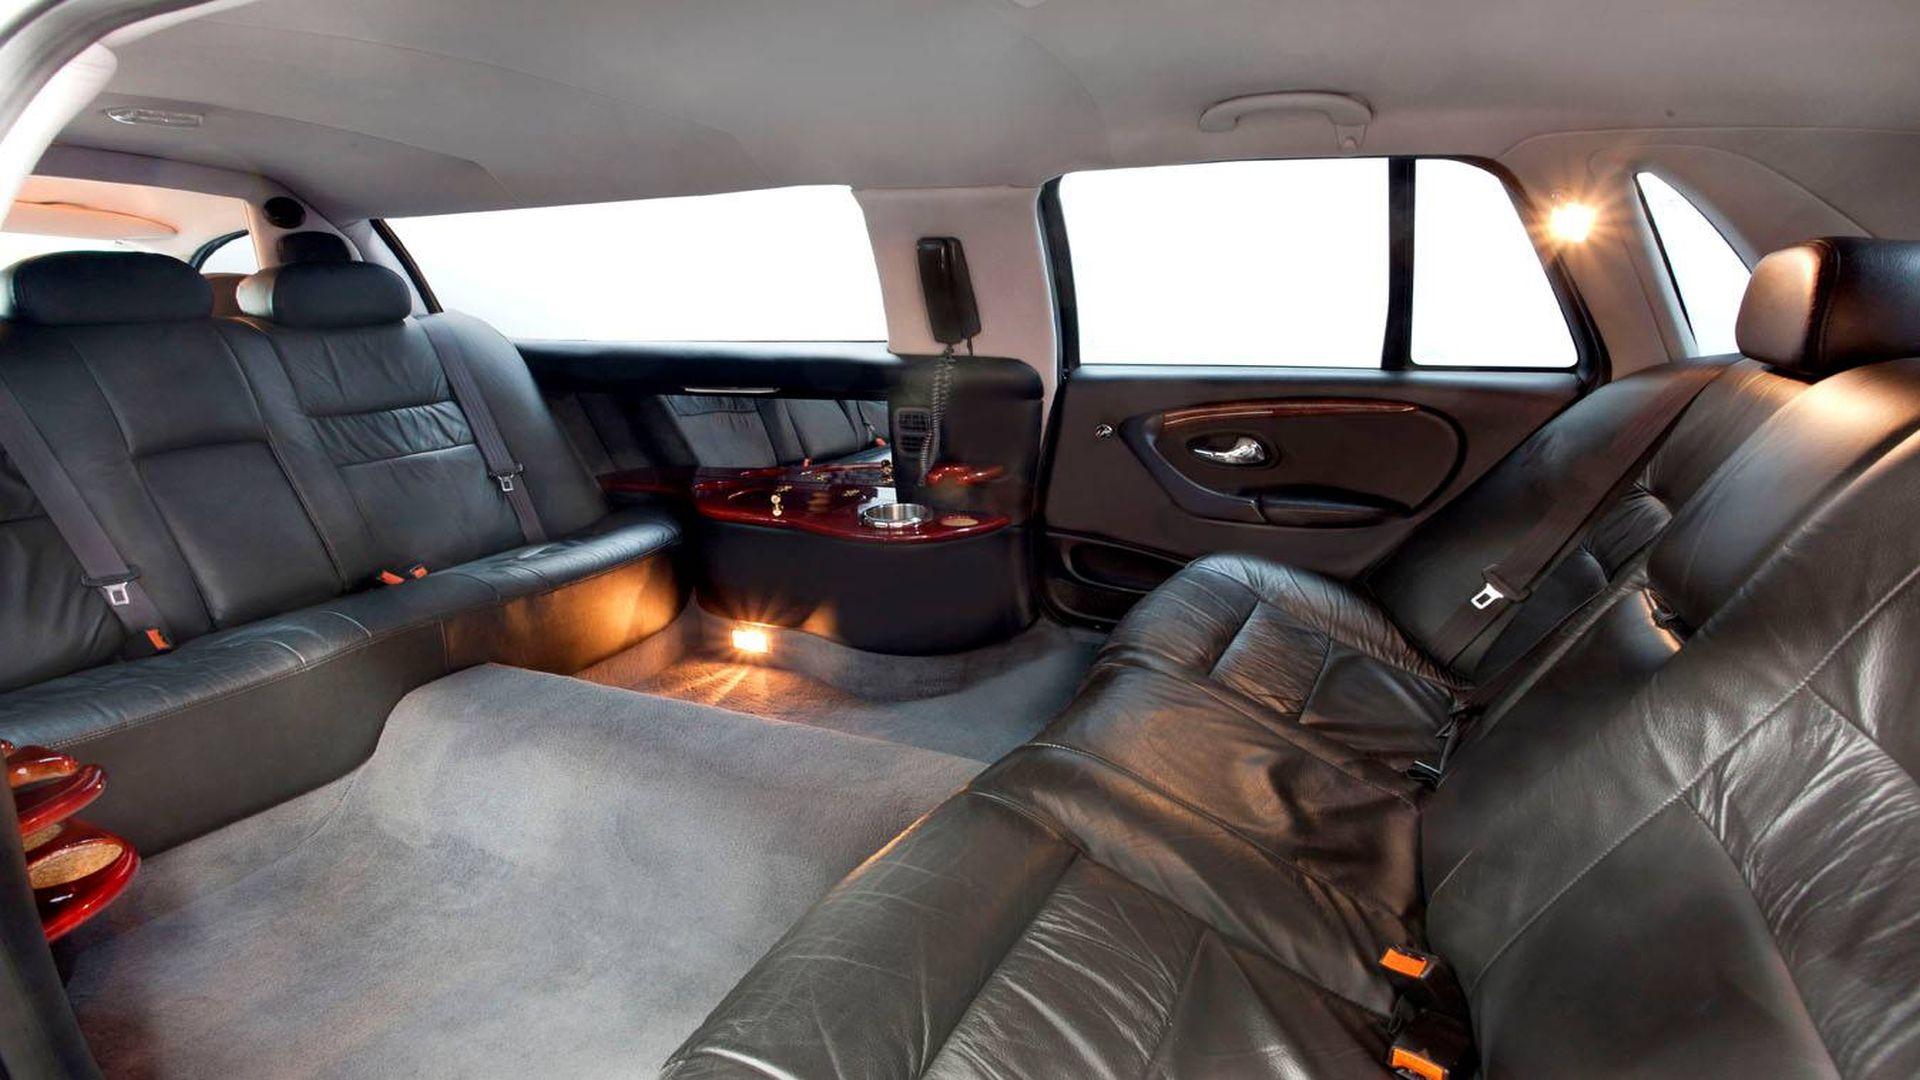 7 Seater Stretch Ford LTD Interior